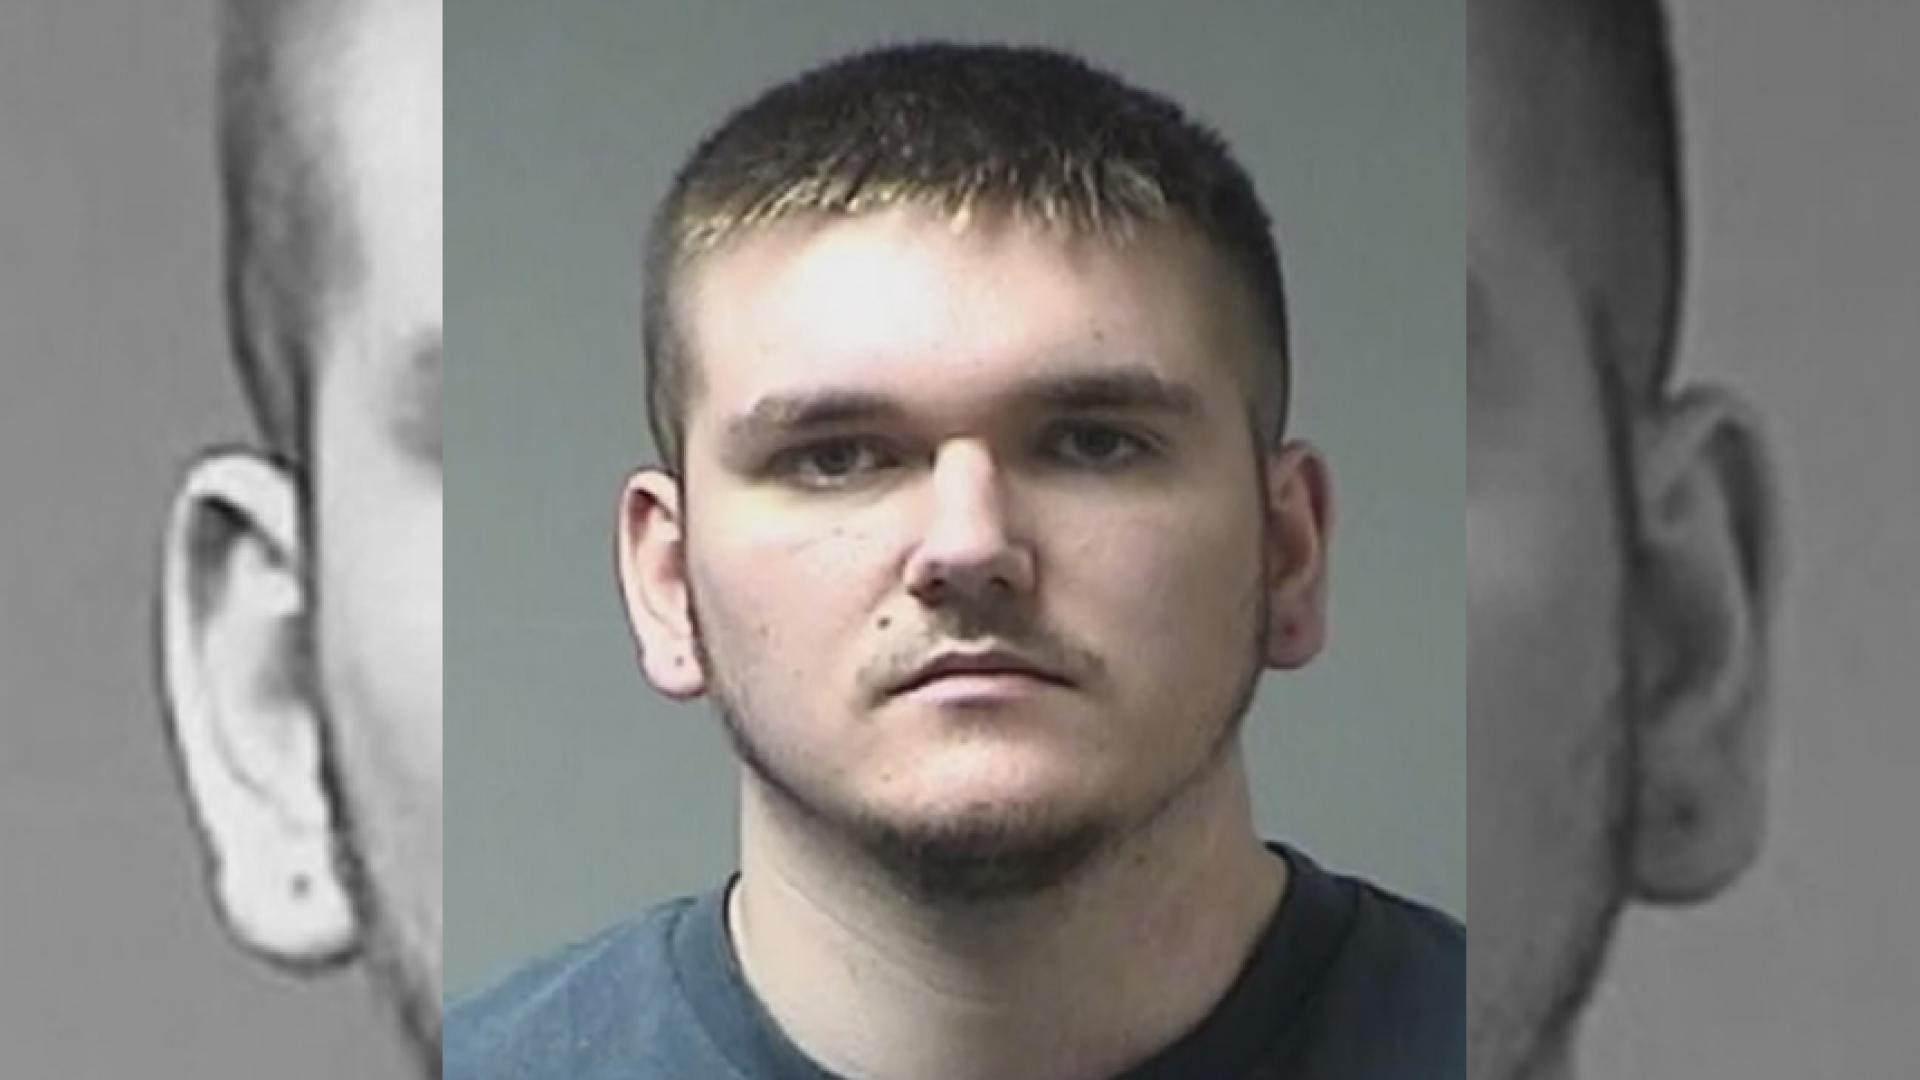 Serial Craigslist Cat Killer Arrested, Authorities Say